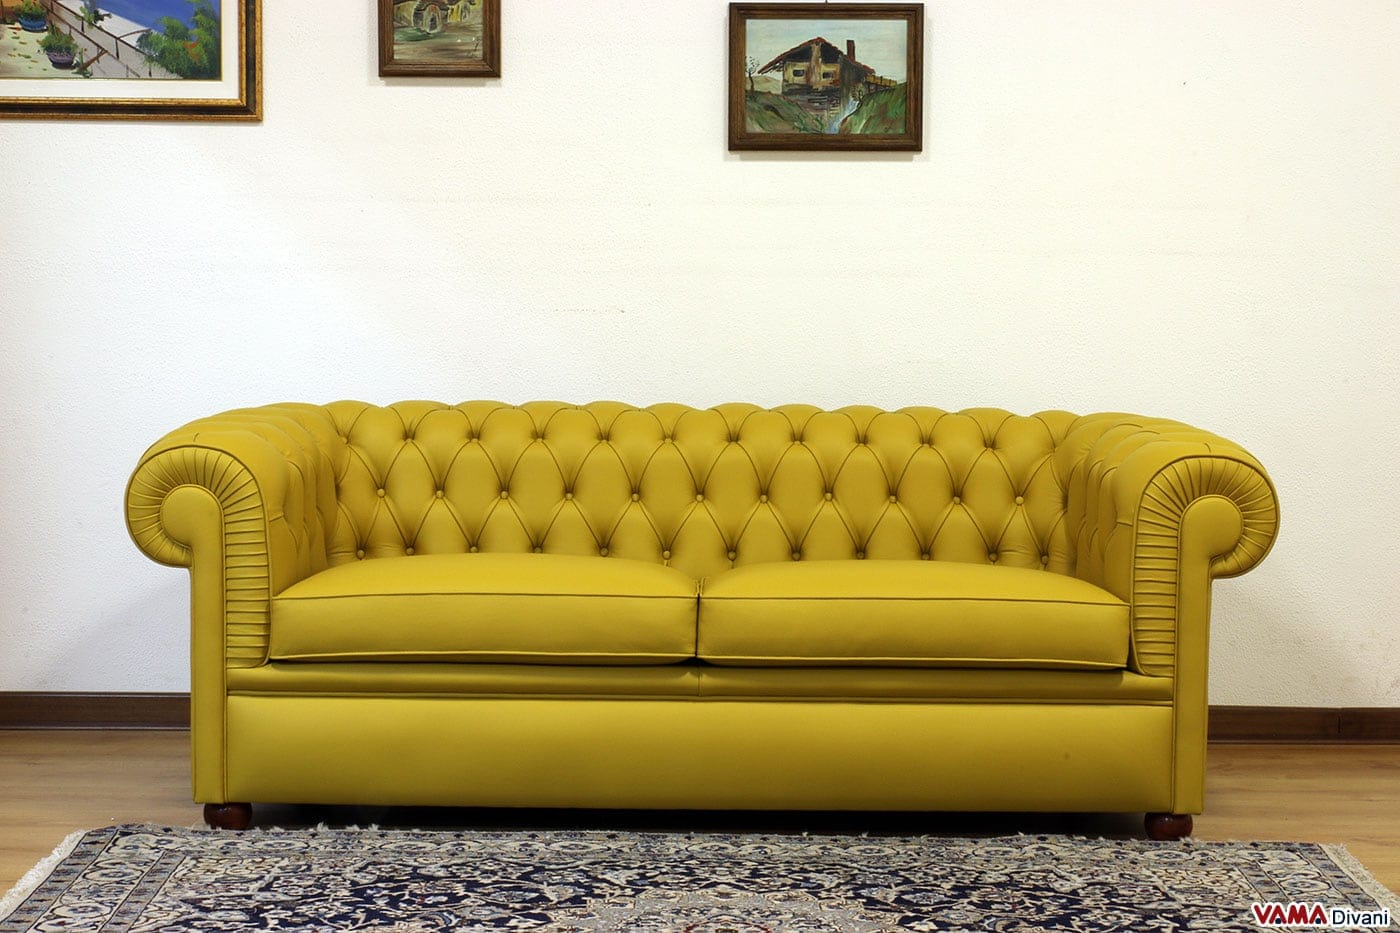 Poltrona Frau Chester Sofa.Modern Furniture Design Magazine Made ...